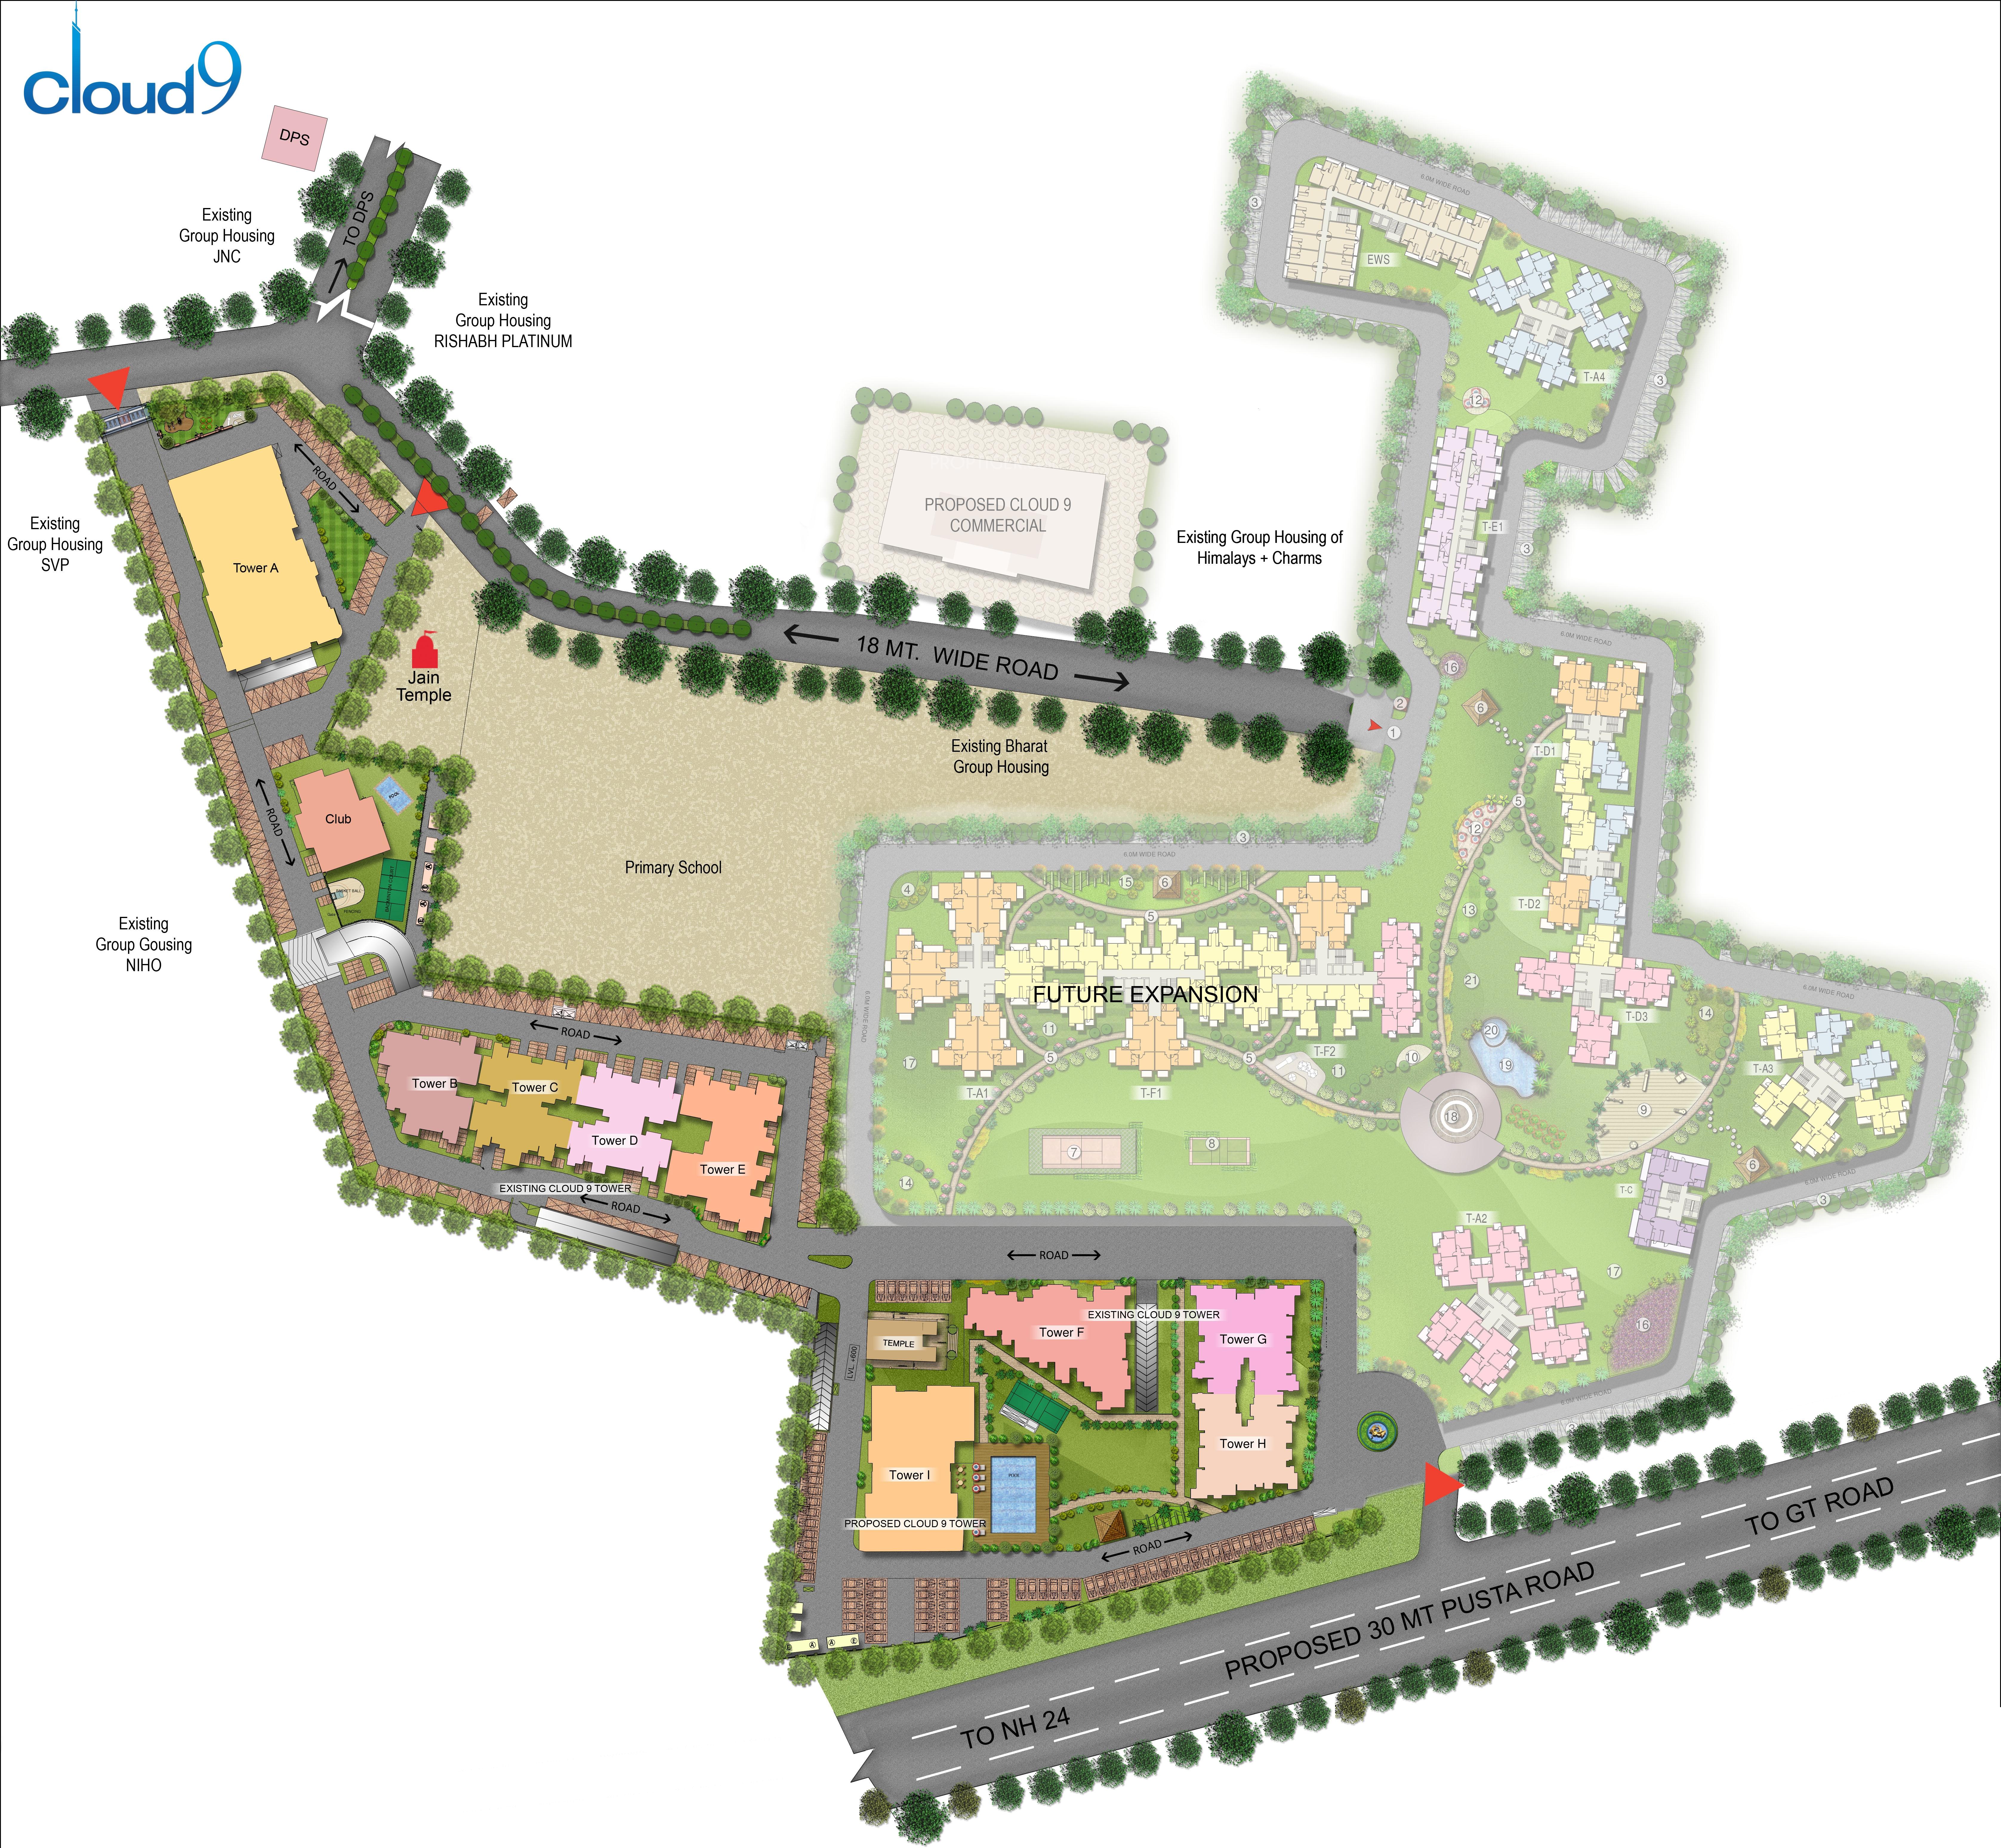 Cloud 9 skylish indirapuram ghaziabad flats in indirapuram price - 2 5